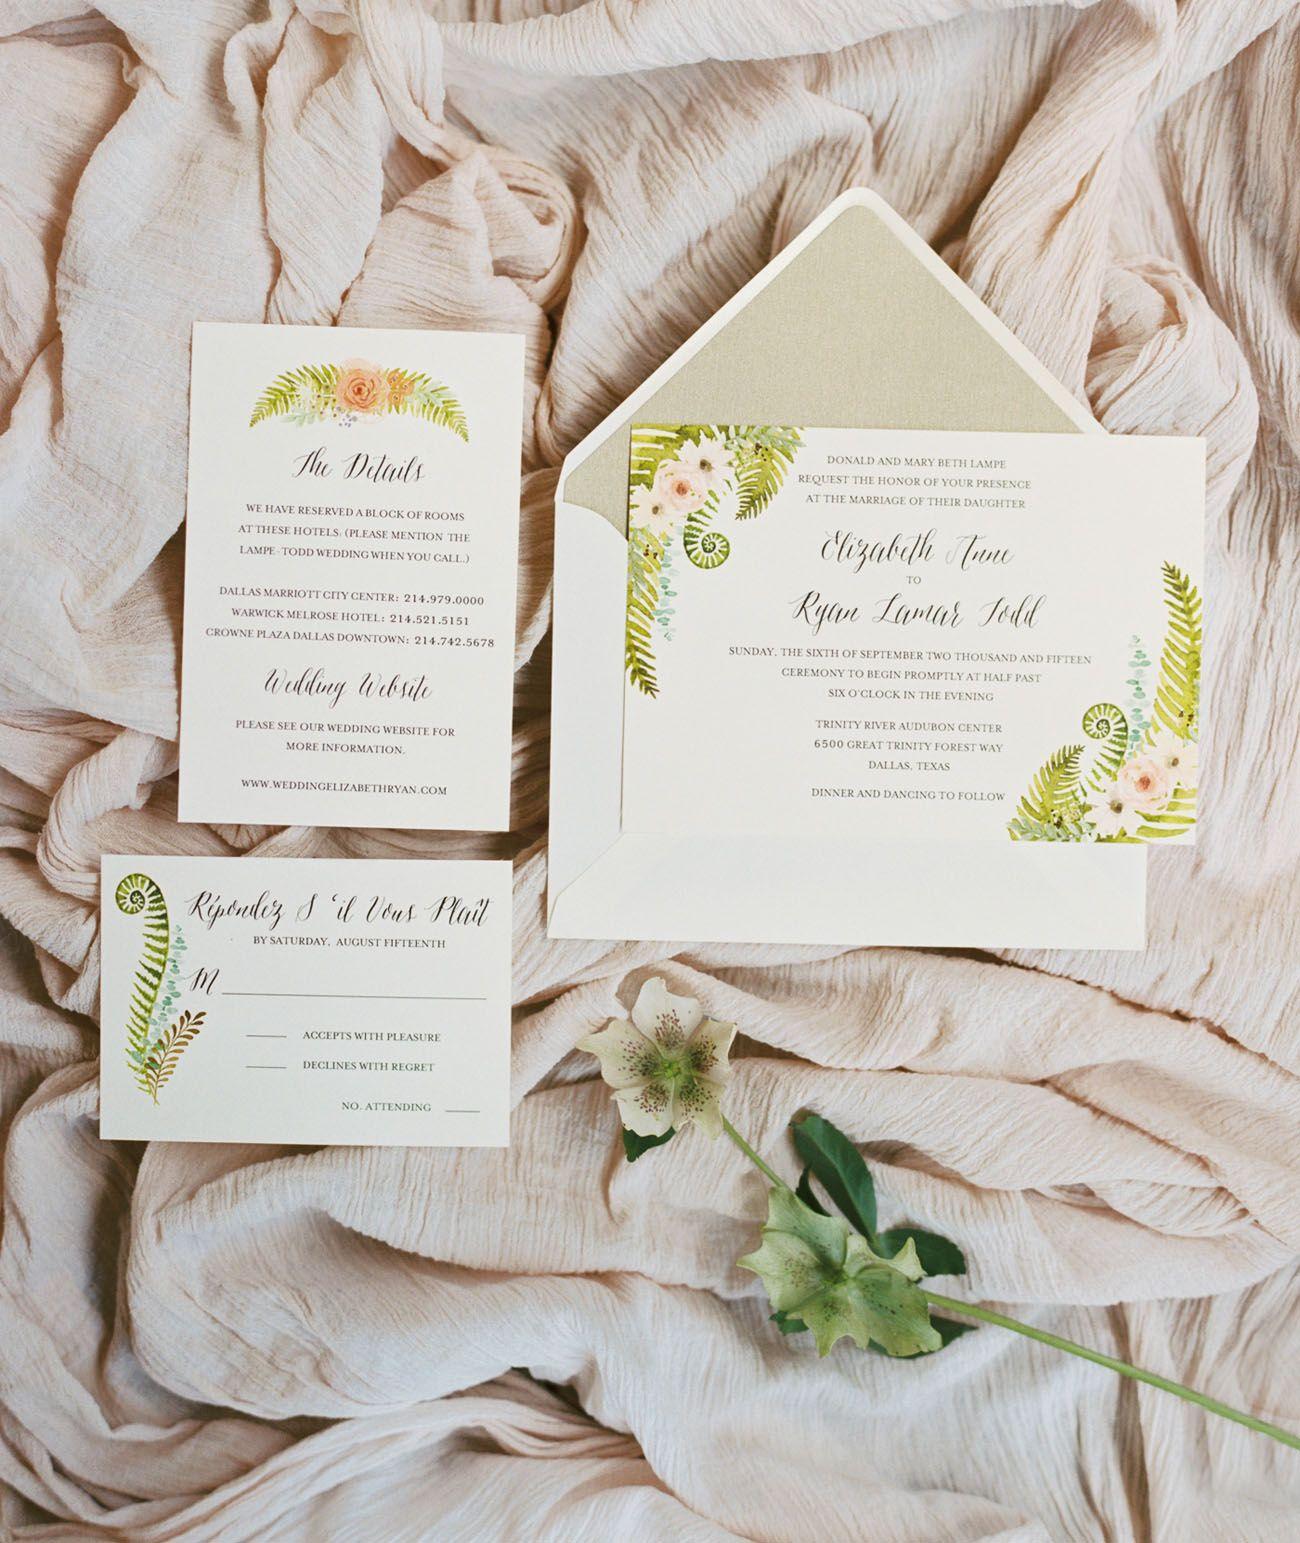 Dallas audubon center wedding elizabeth ryan floral invitation floral invitation stopboris Choice Image